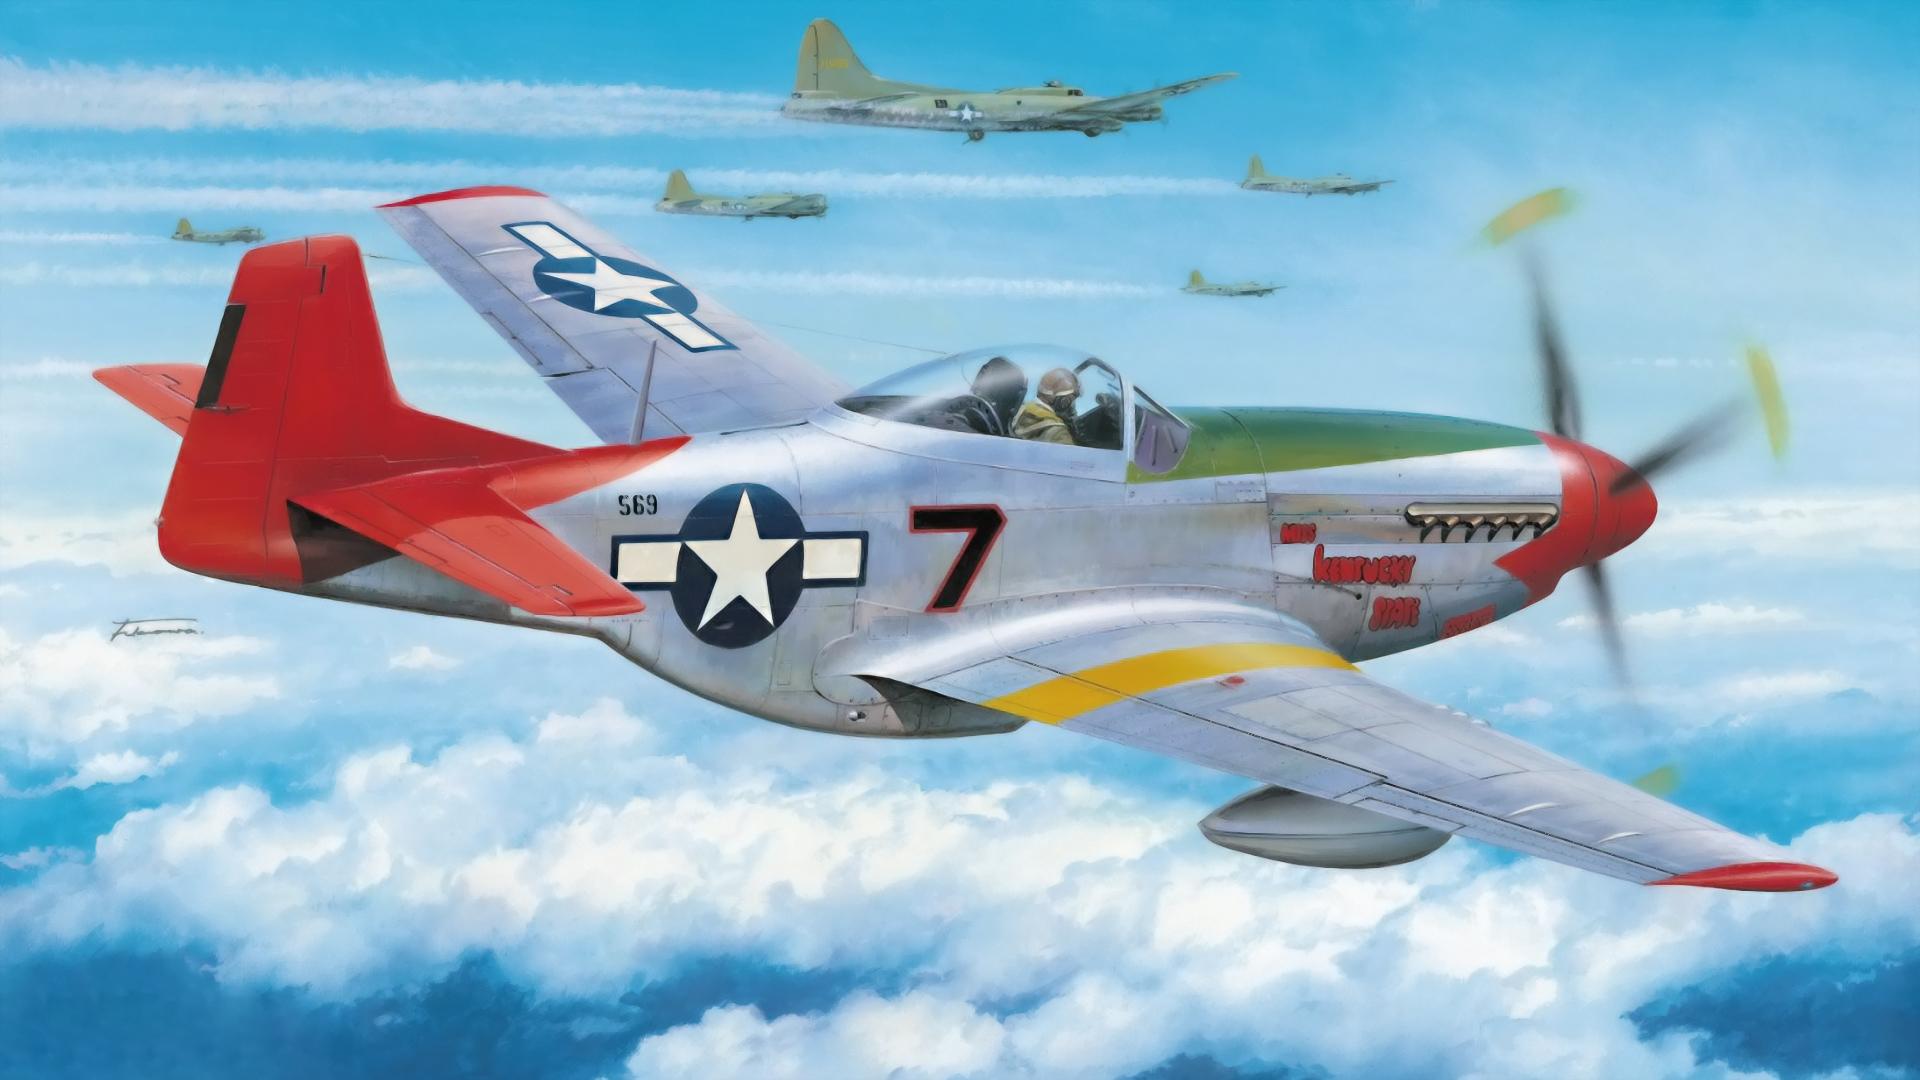 ww2 aviation art wallpaper wallpapersafari